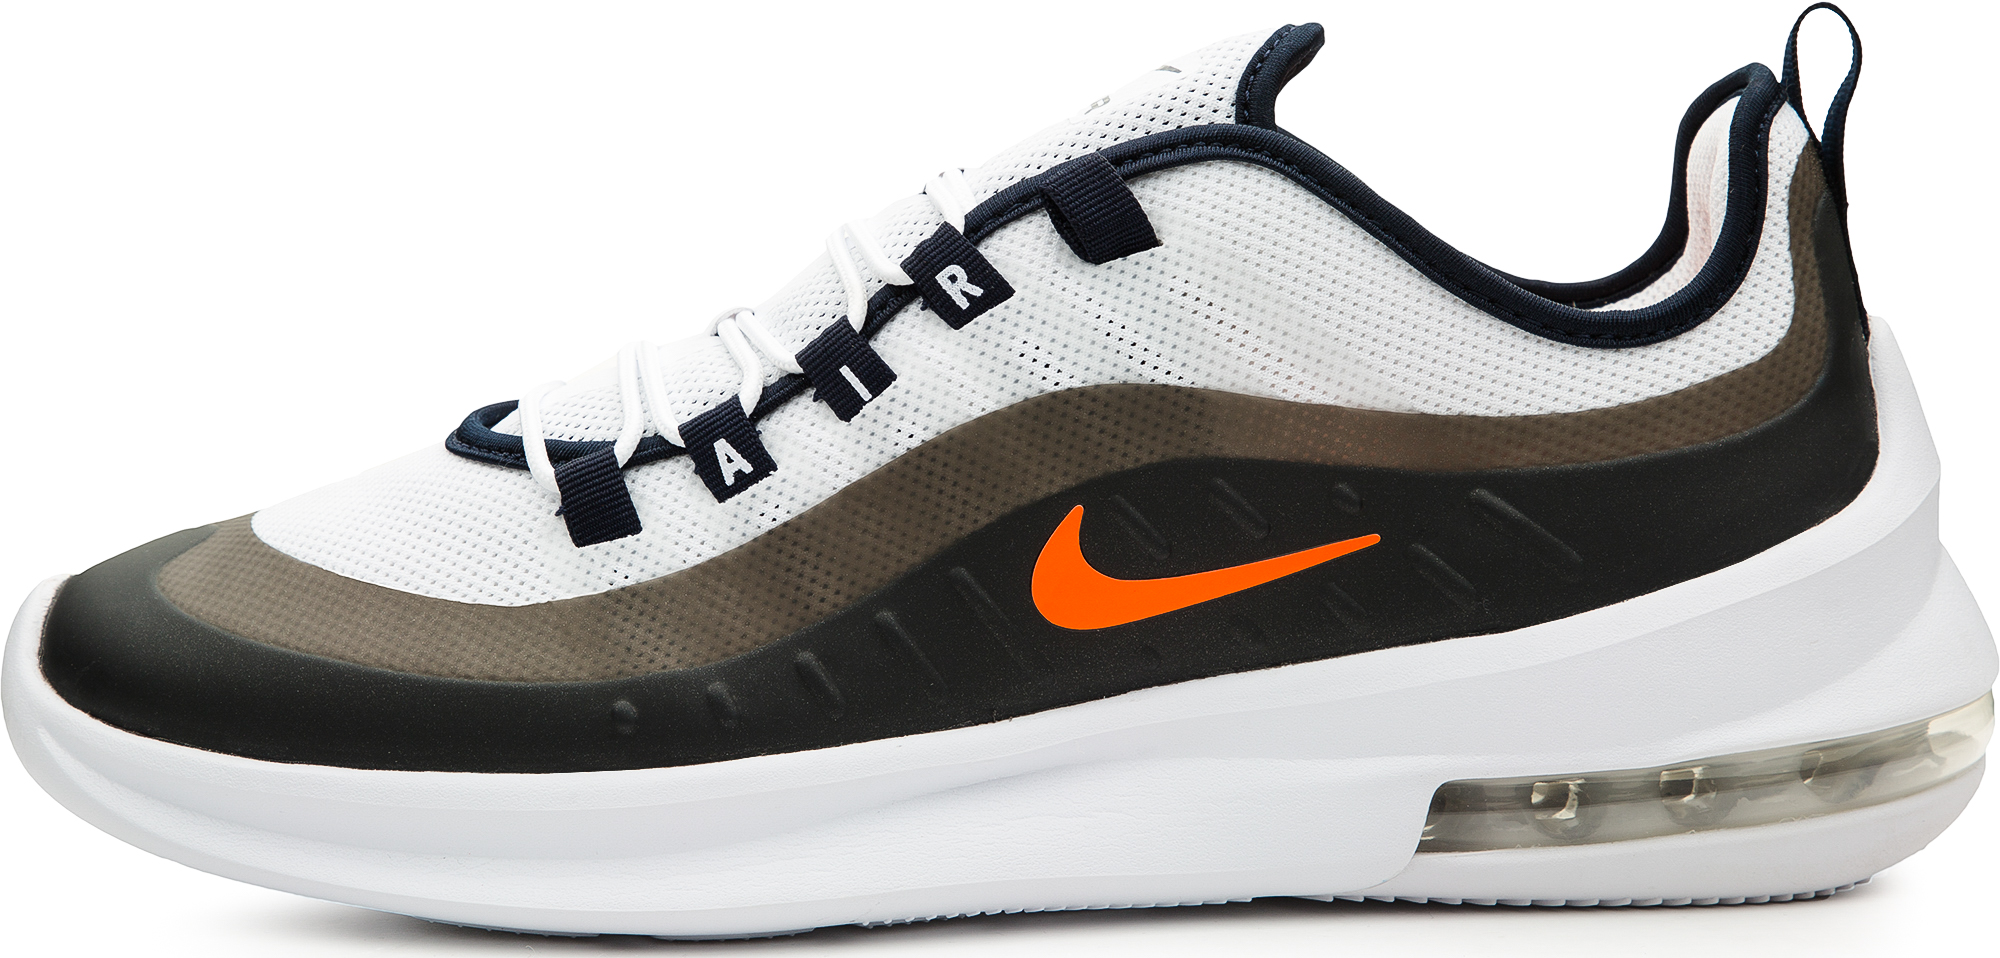 Nike Кроссовки мужские Nike Air Max Axis, размер 44